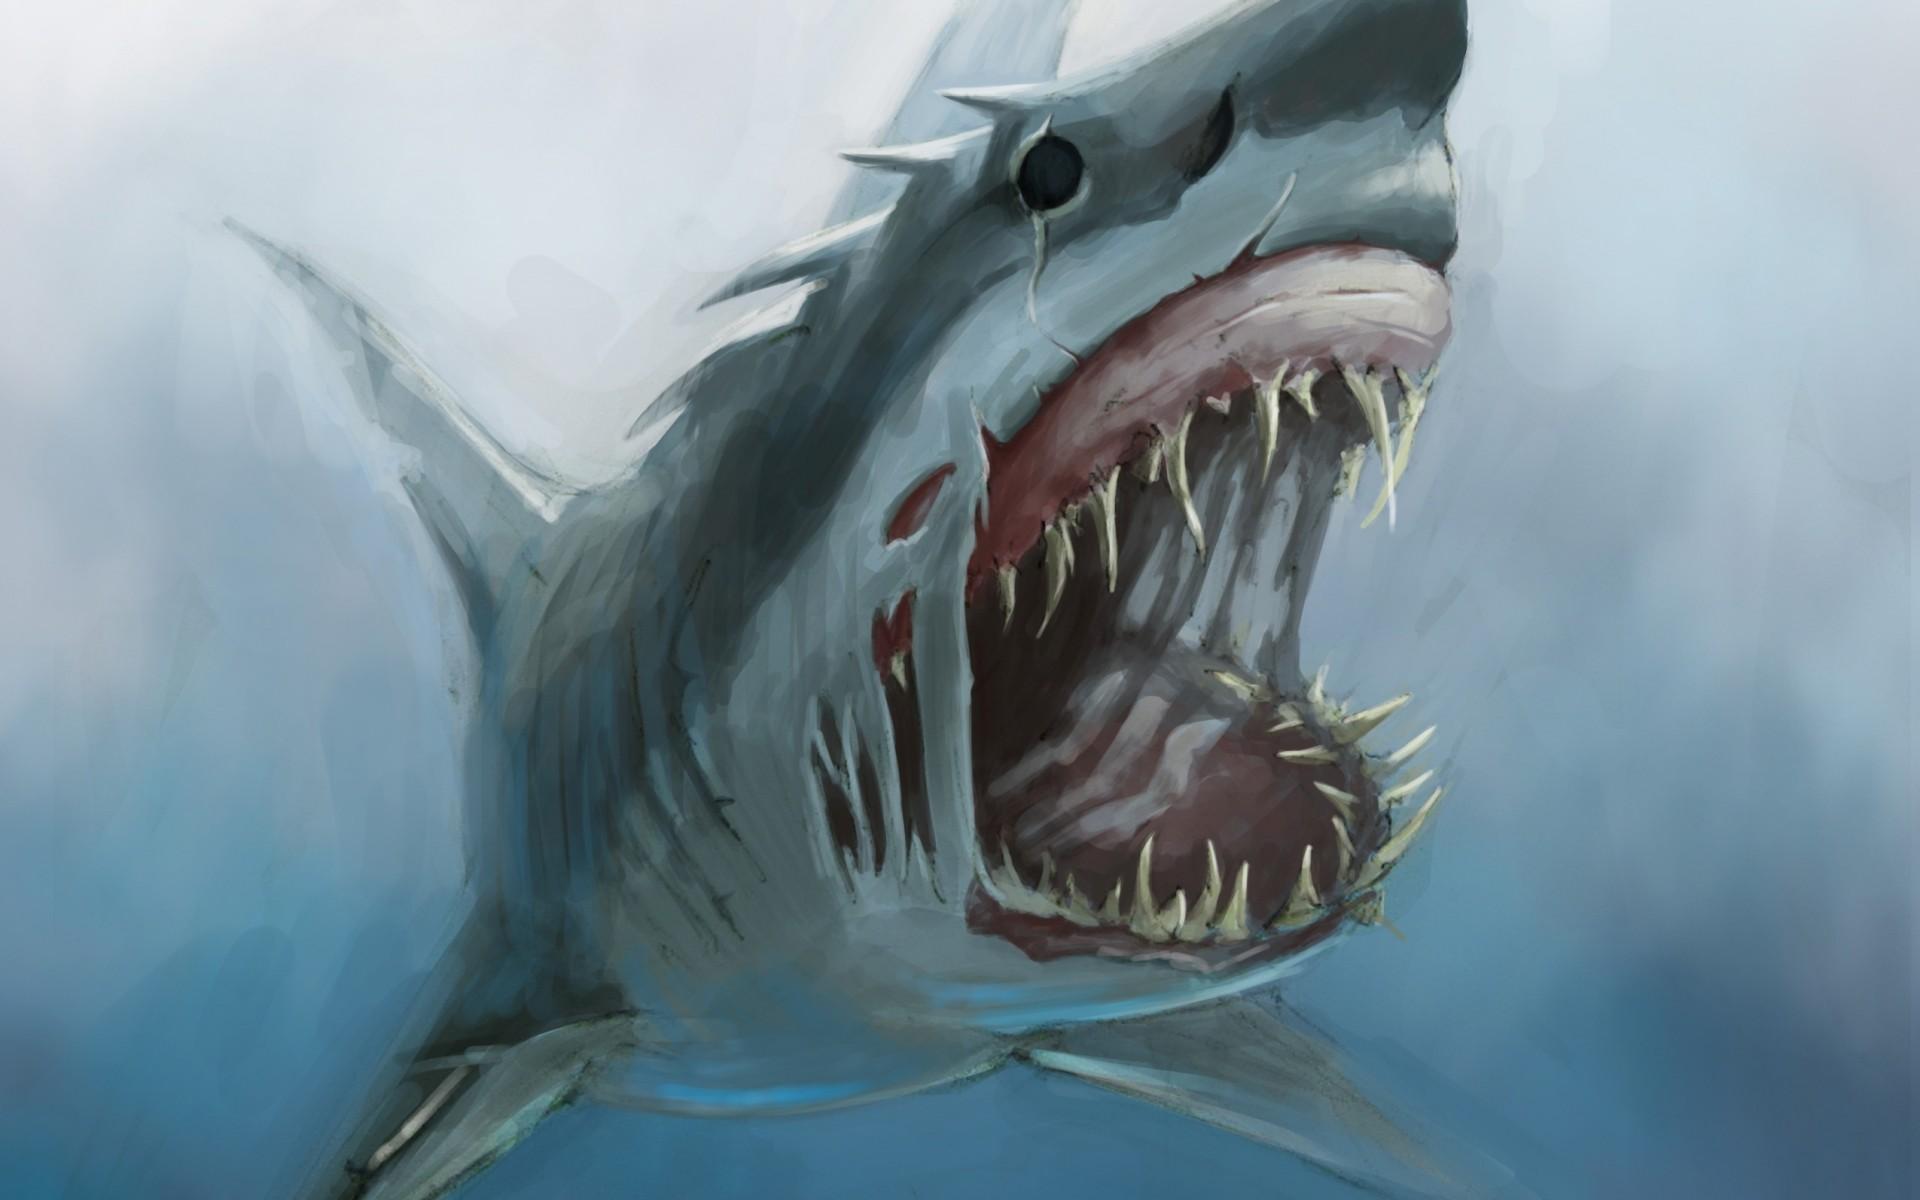 Shark Teeth Wallpaper Art Shark Monster Mouth Teeth